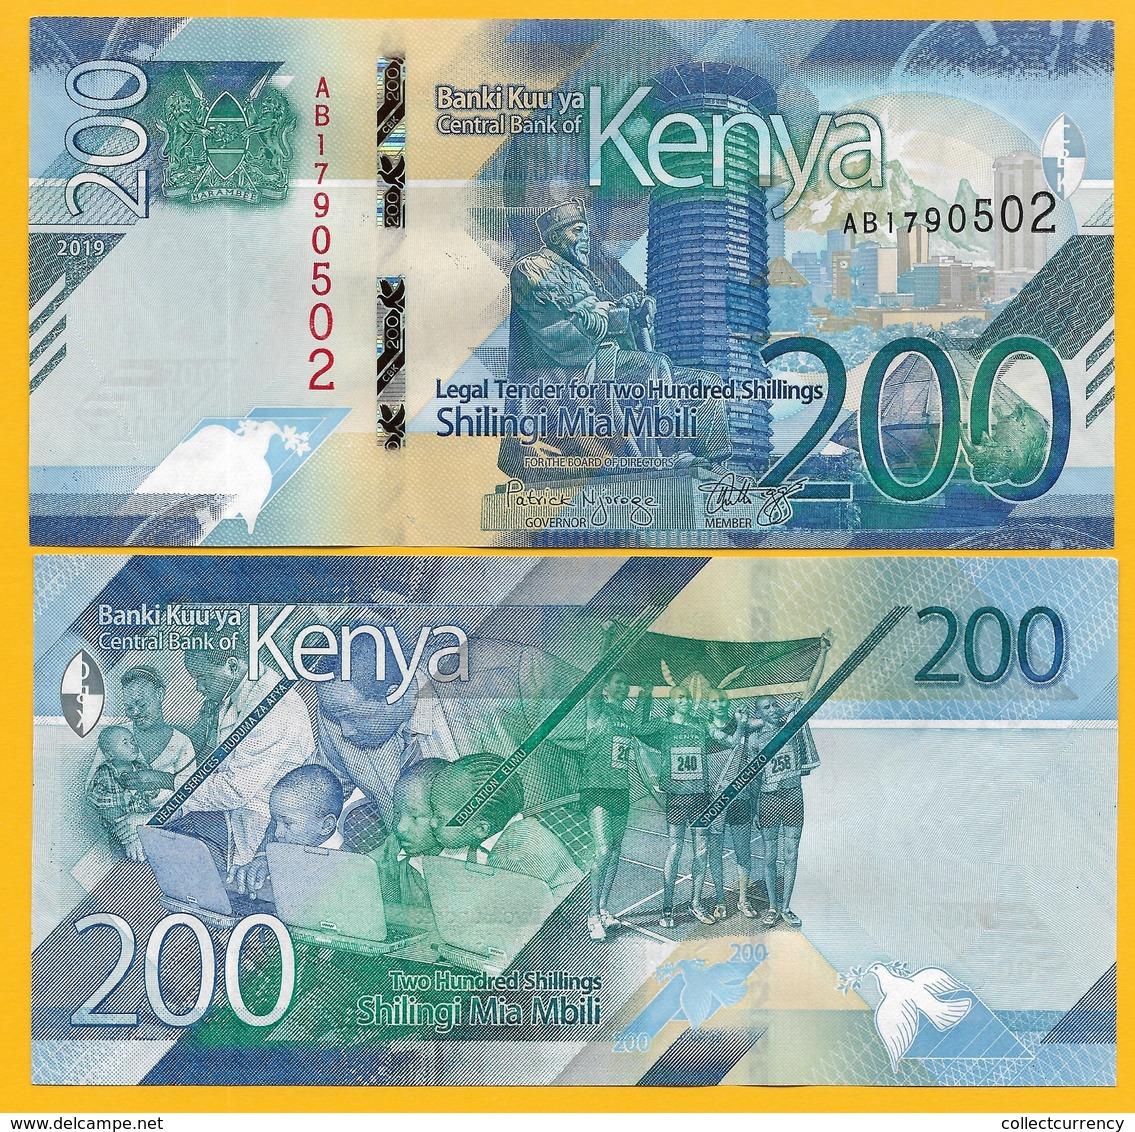 Kenya 200 Shillings P-NEW 2019 UNC Banknote - Kenya